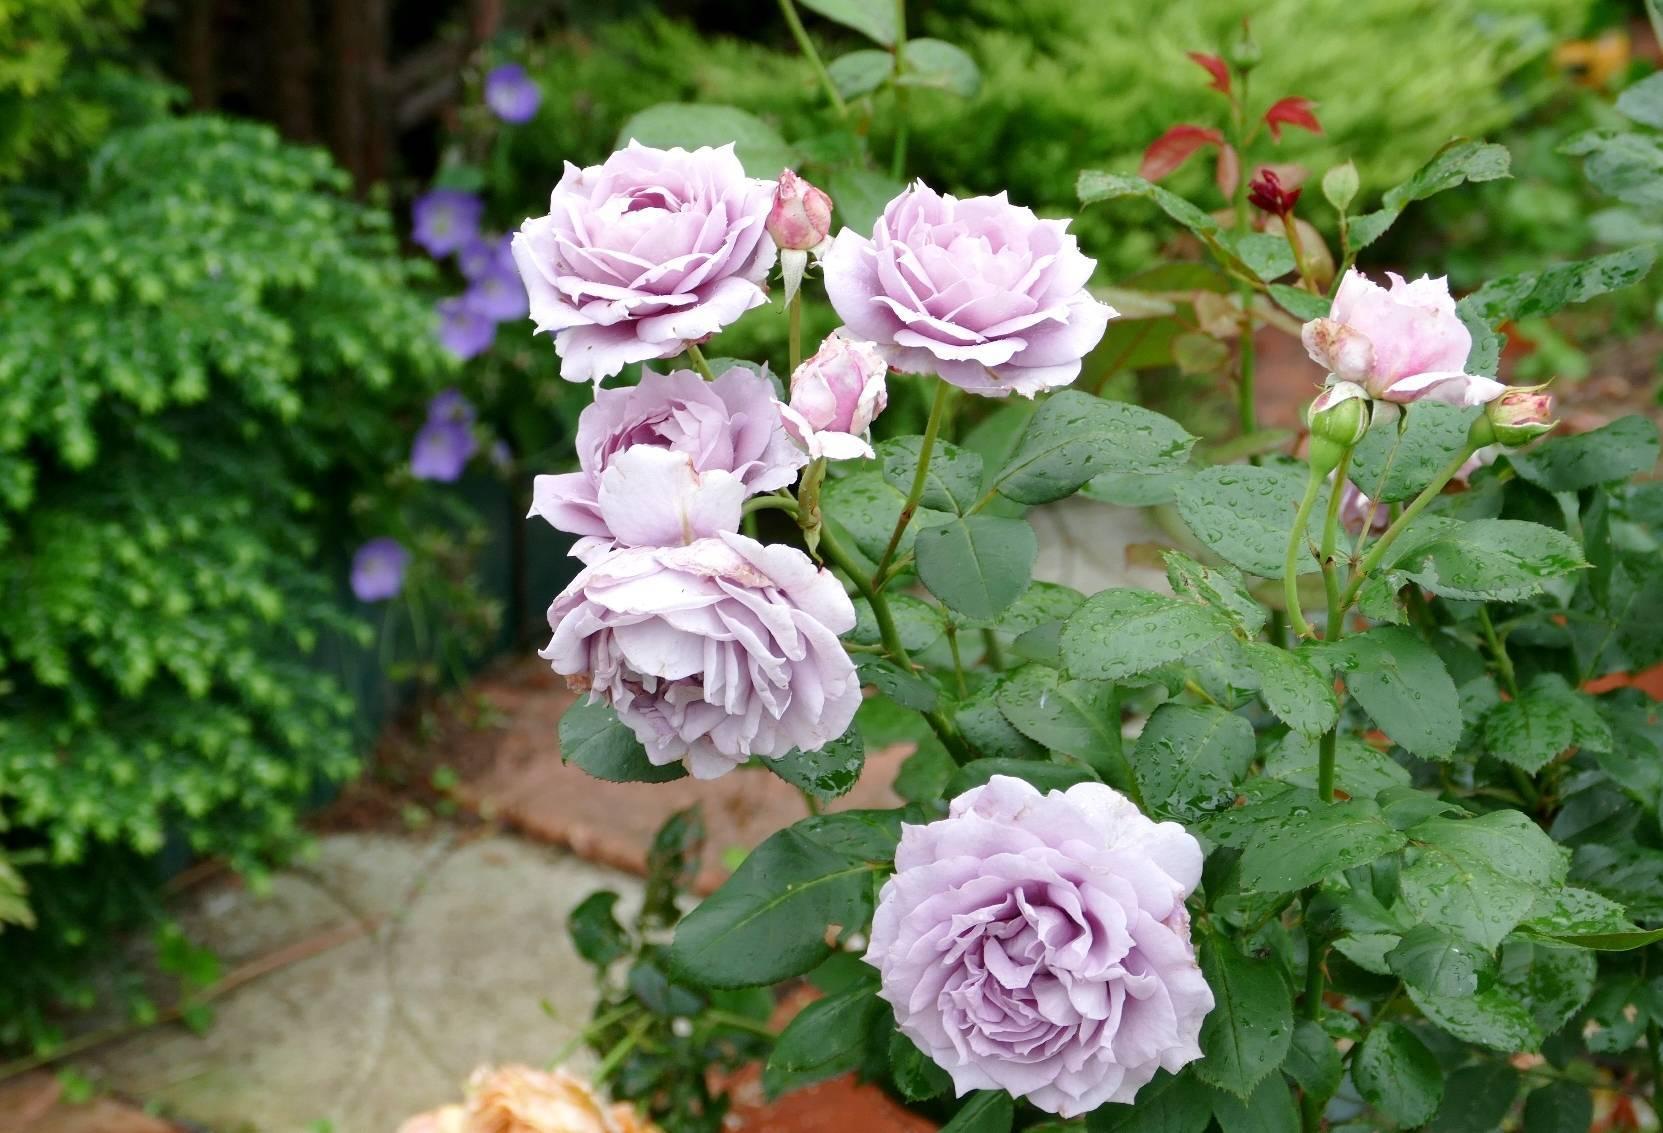 Роза новалис (novalis): описание, фото и характеристика сорта, отличие от других разновидностей, особенности выращивания, ухода и размножения, болезни и вредители